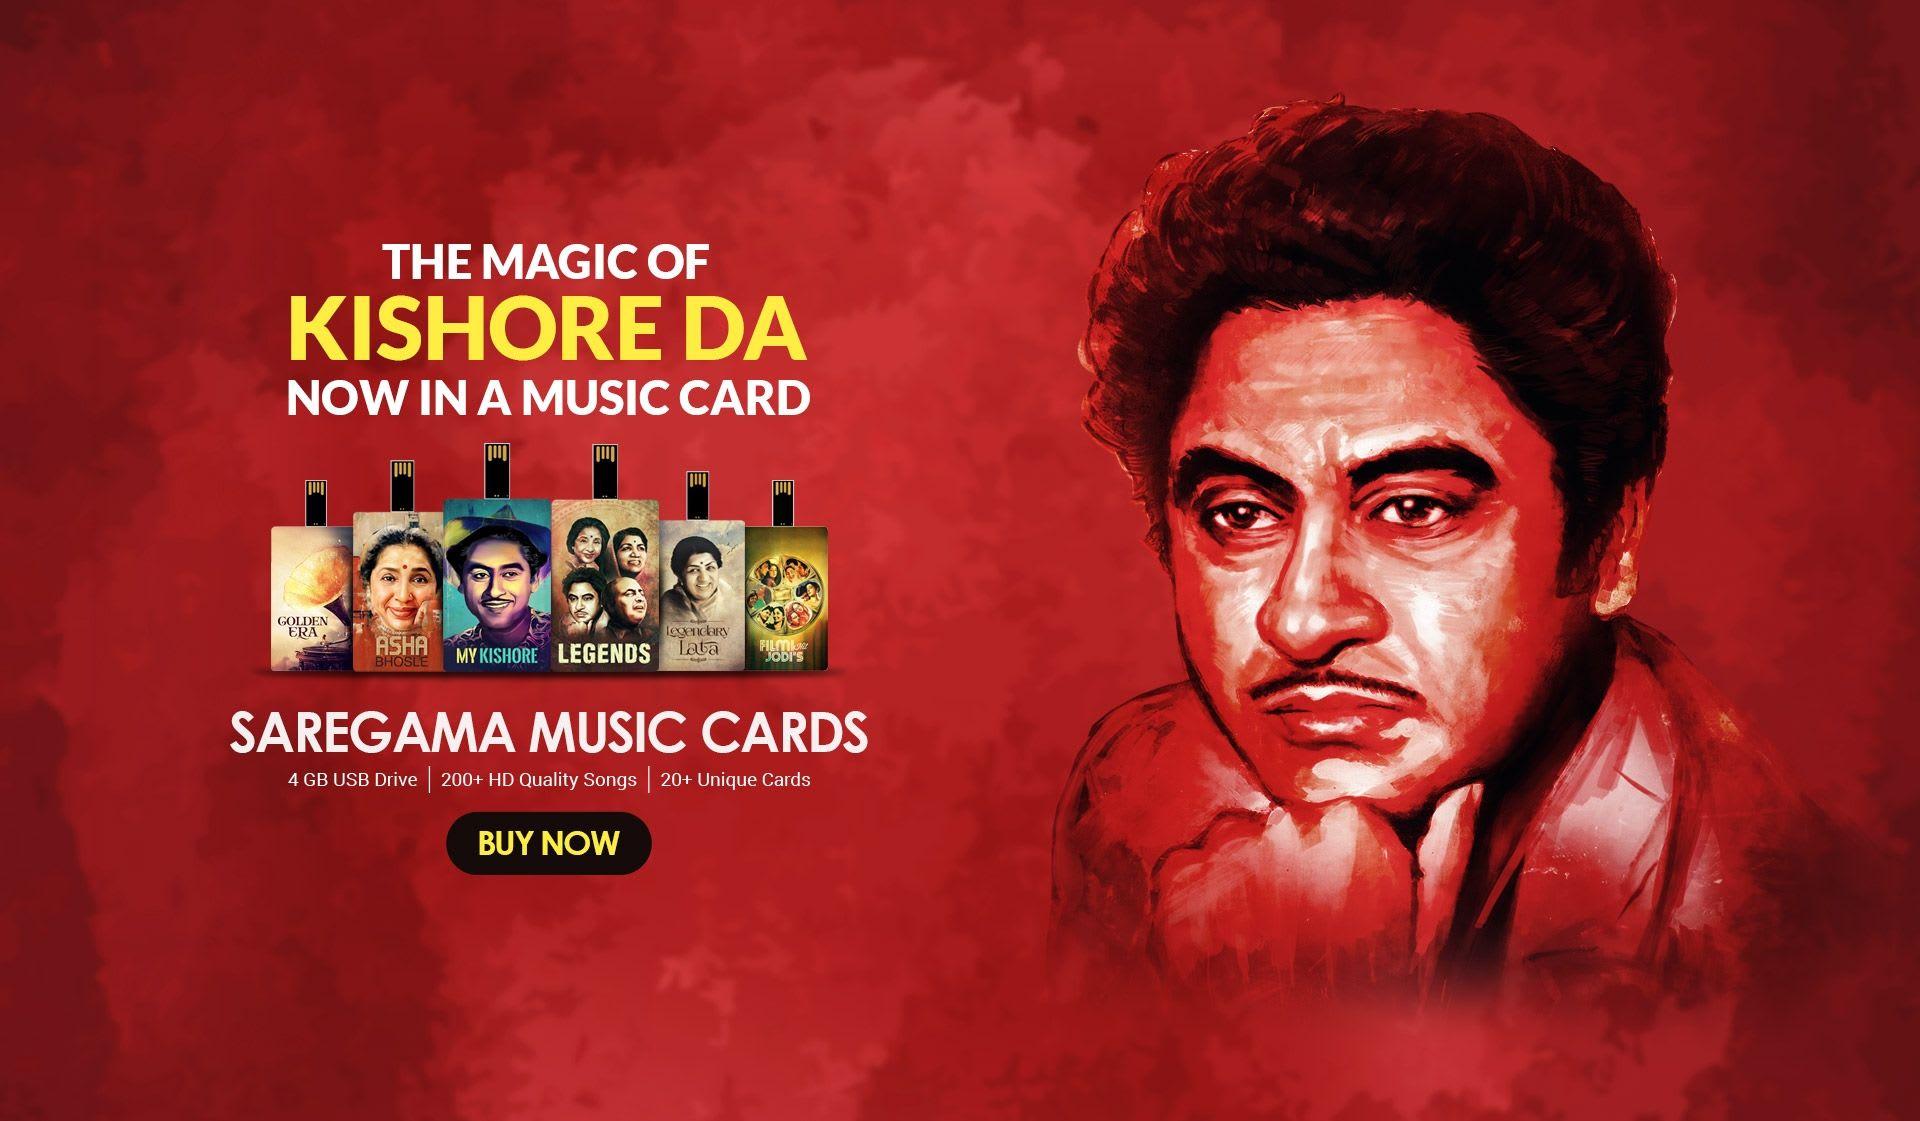 The Magic Of Kishore Da